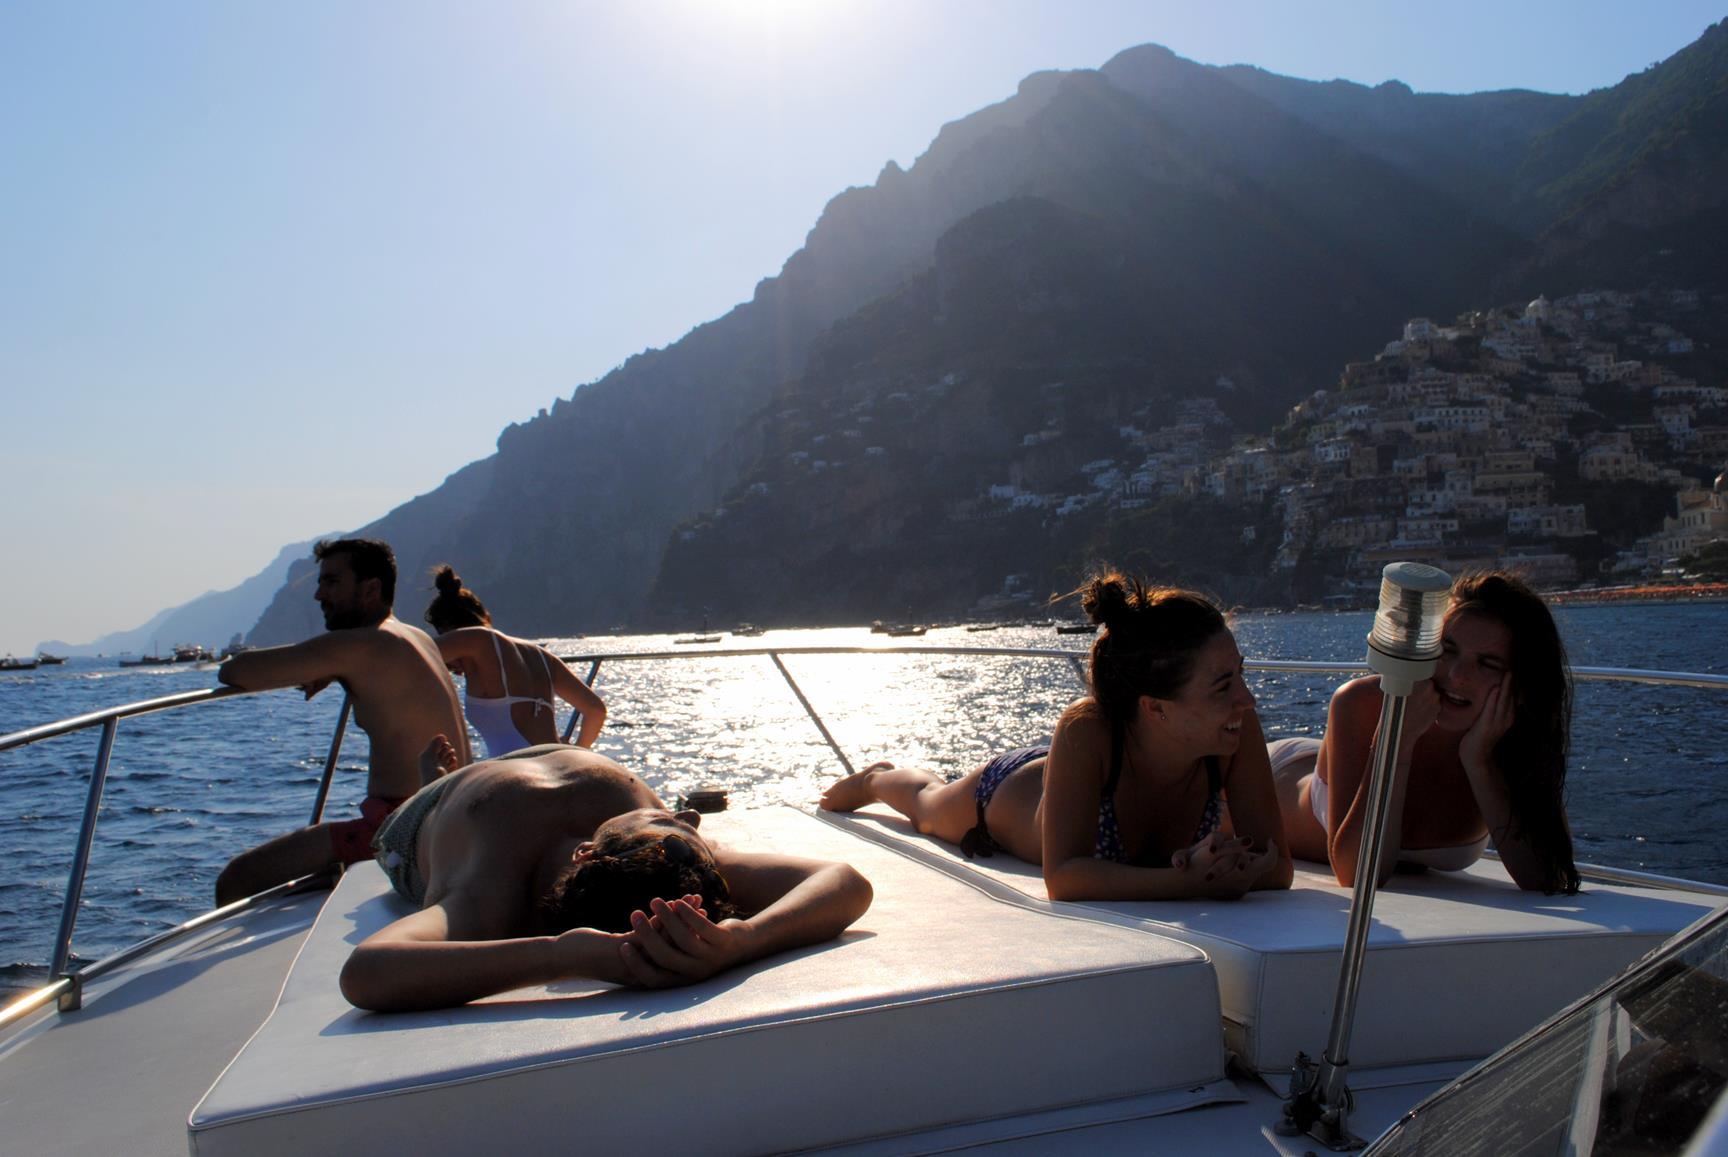 alquilar_barco_costa_amalfitana